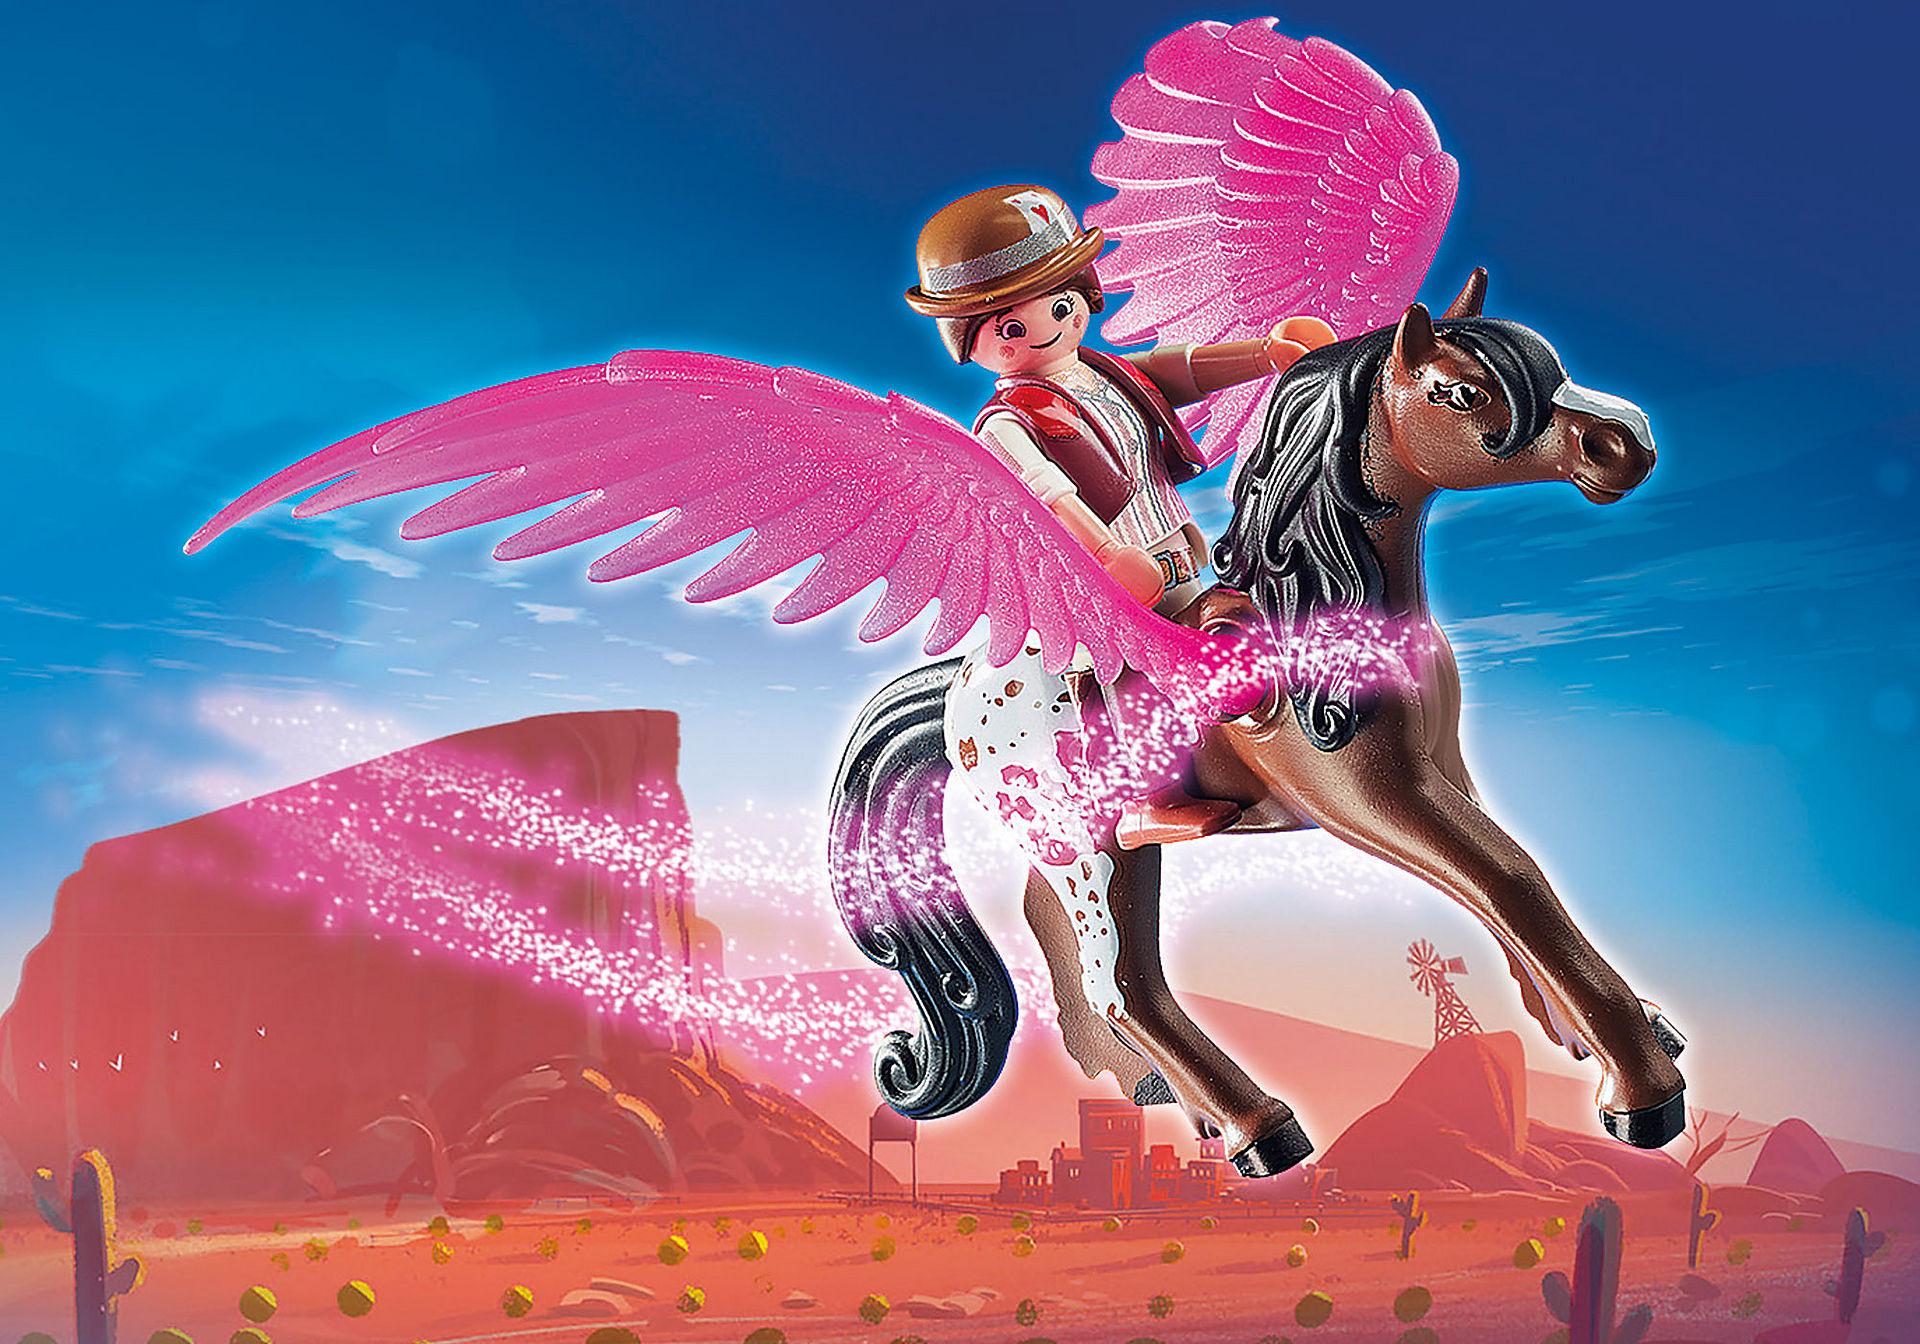 http://media.playmobil.com/i/playmobil/70074_product_extra1/PLAYMOBIL: THE MOVIE Marla, Del y Caballo con Alas